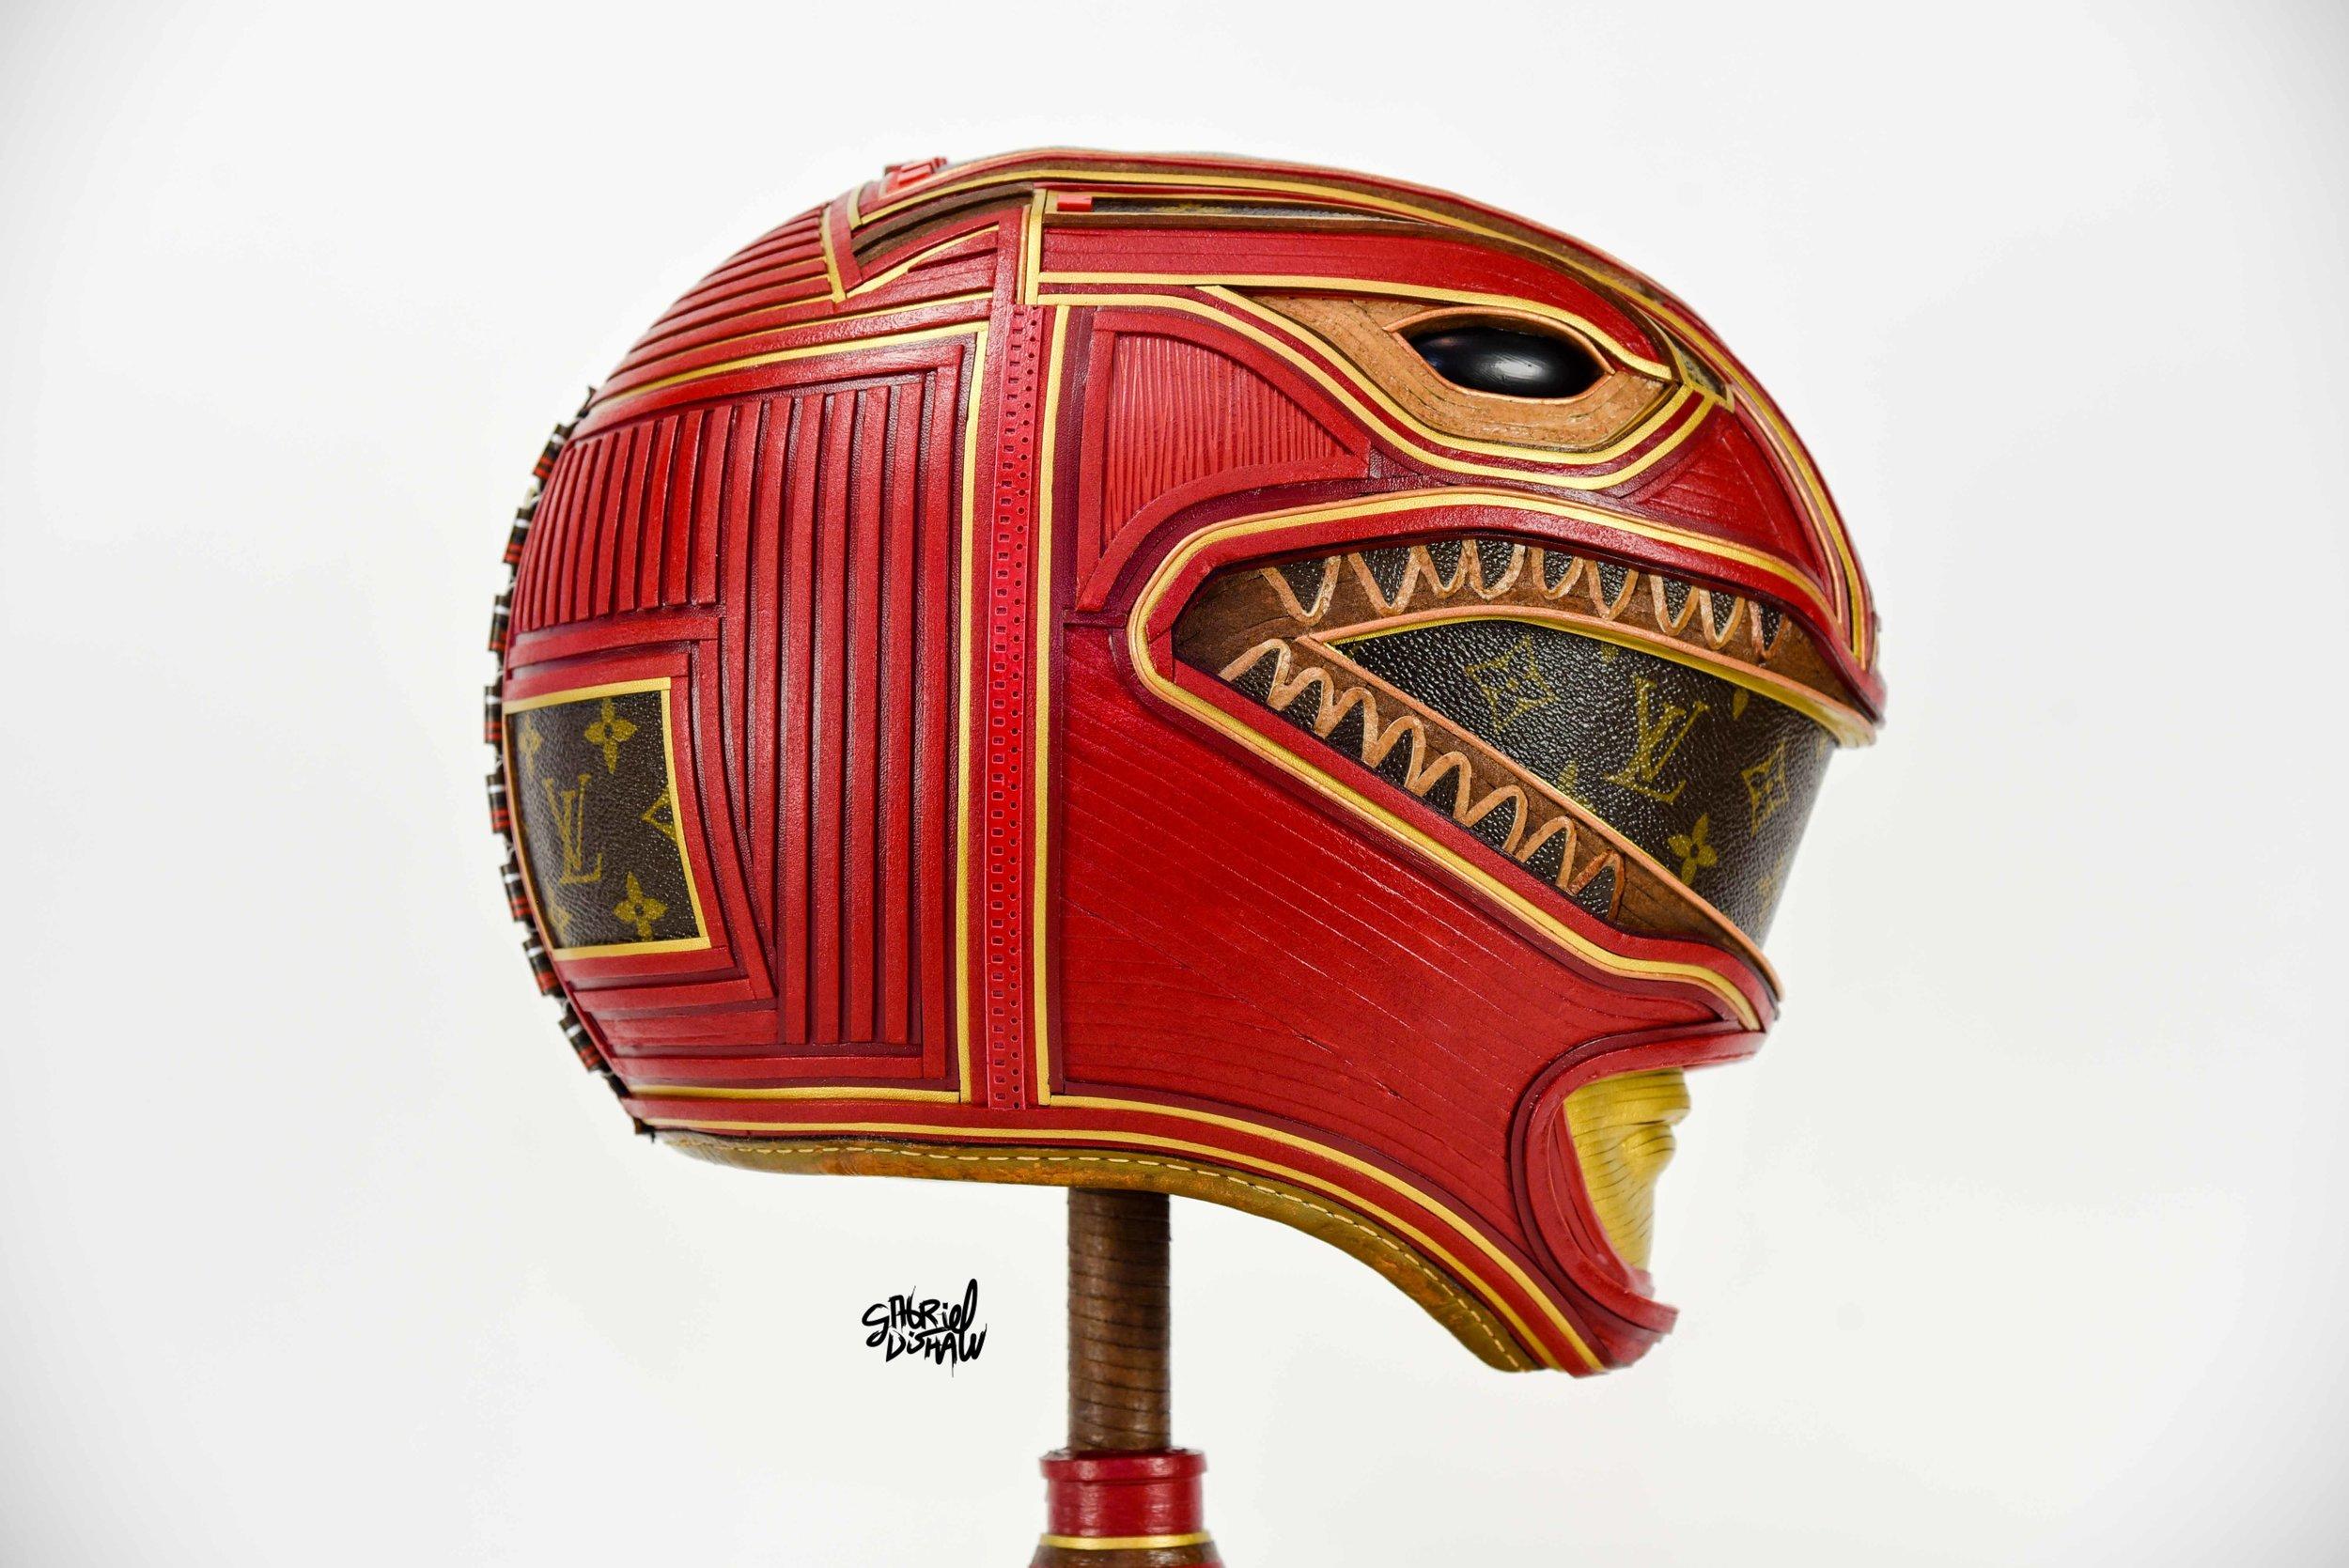 Gabriel Dishaw LV Red Ranger-3362.jpg